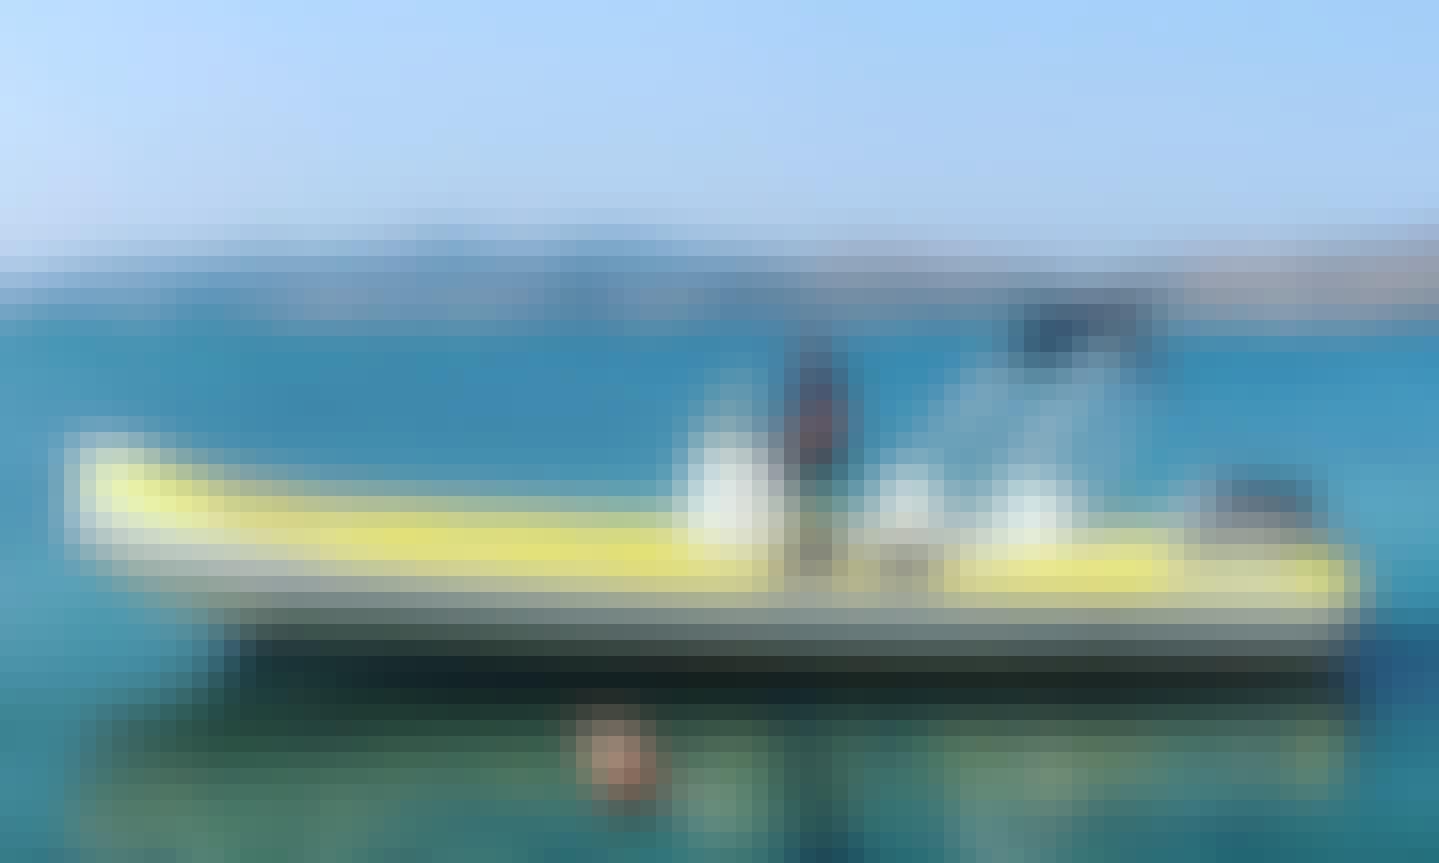 Mariner 690 RIB Rental in Pounta, Greece